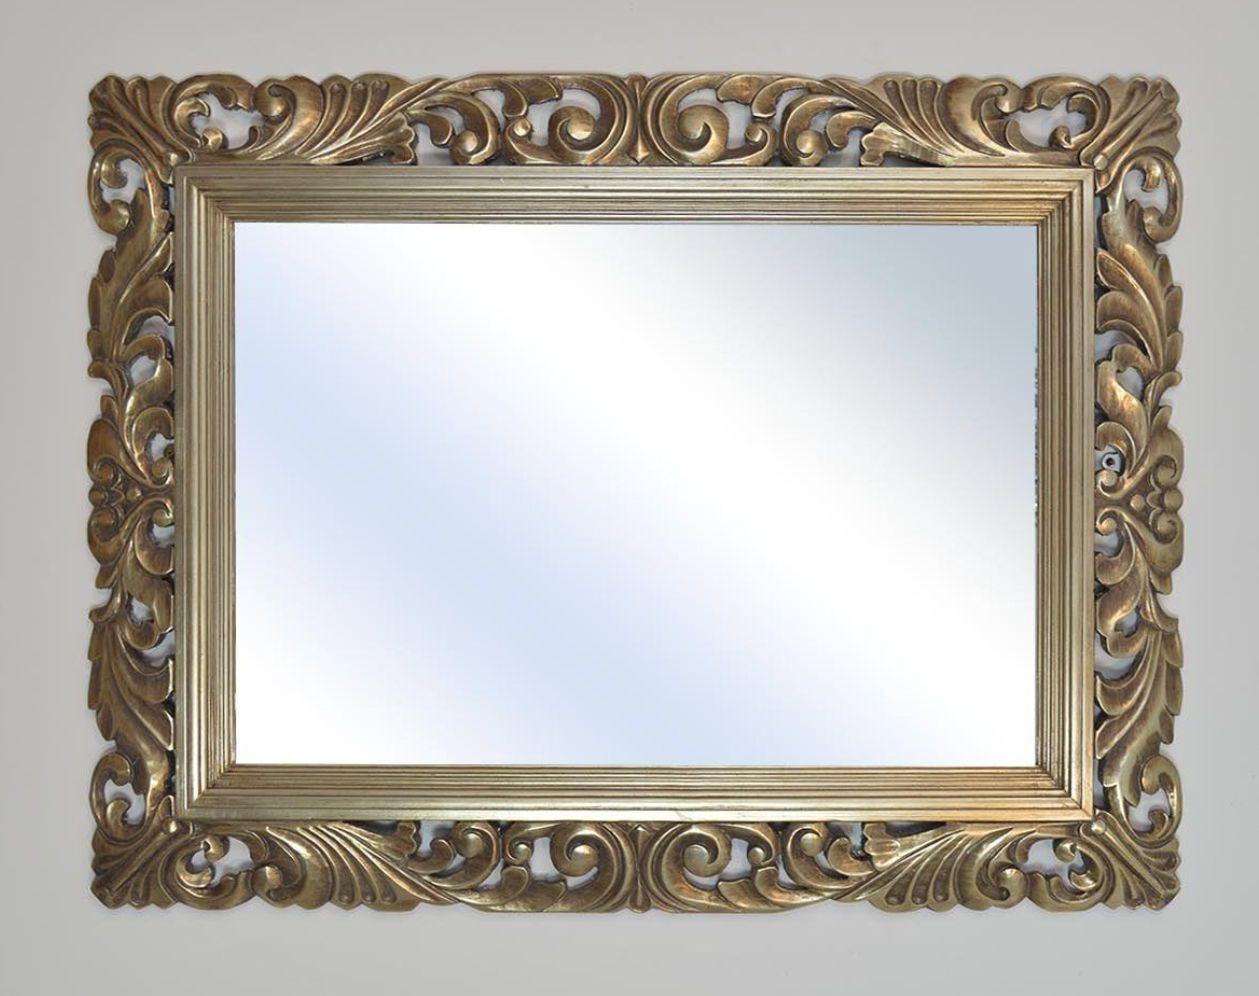 John Lewis Ornate Leaf Wall Mirror 122cm x 91cm Champagne - NEW ...